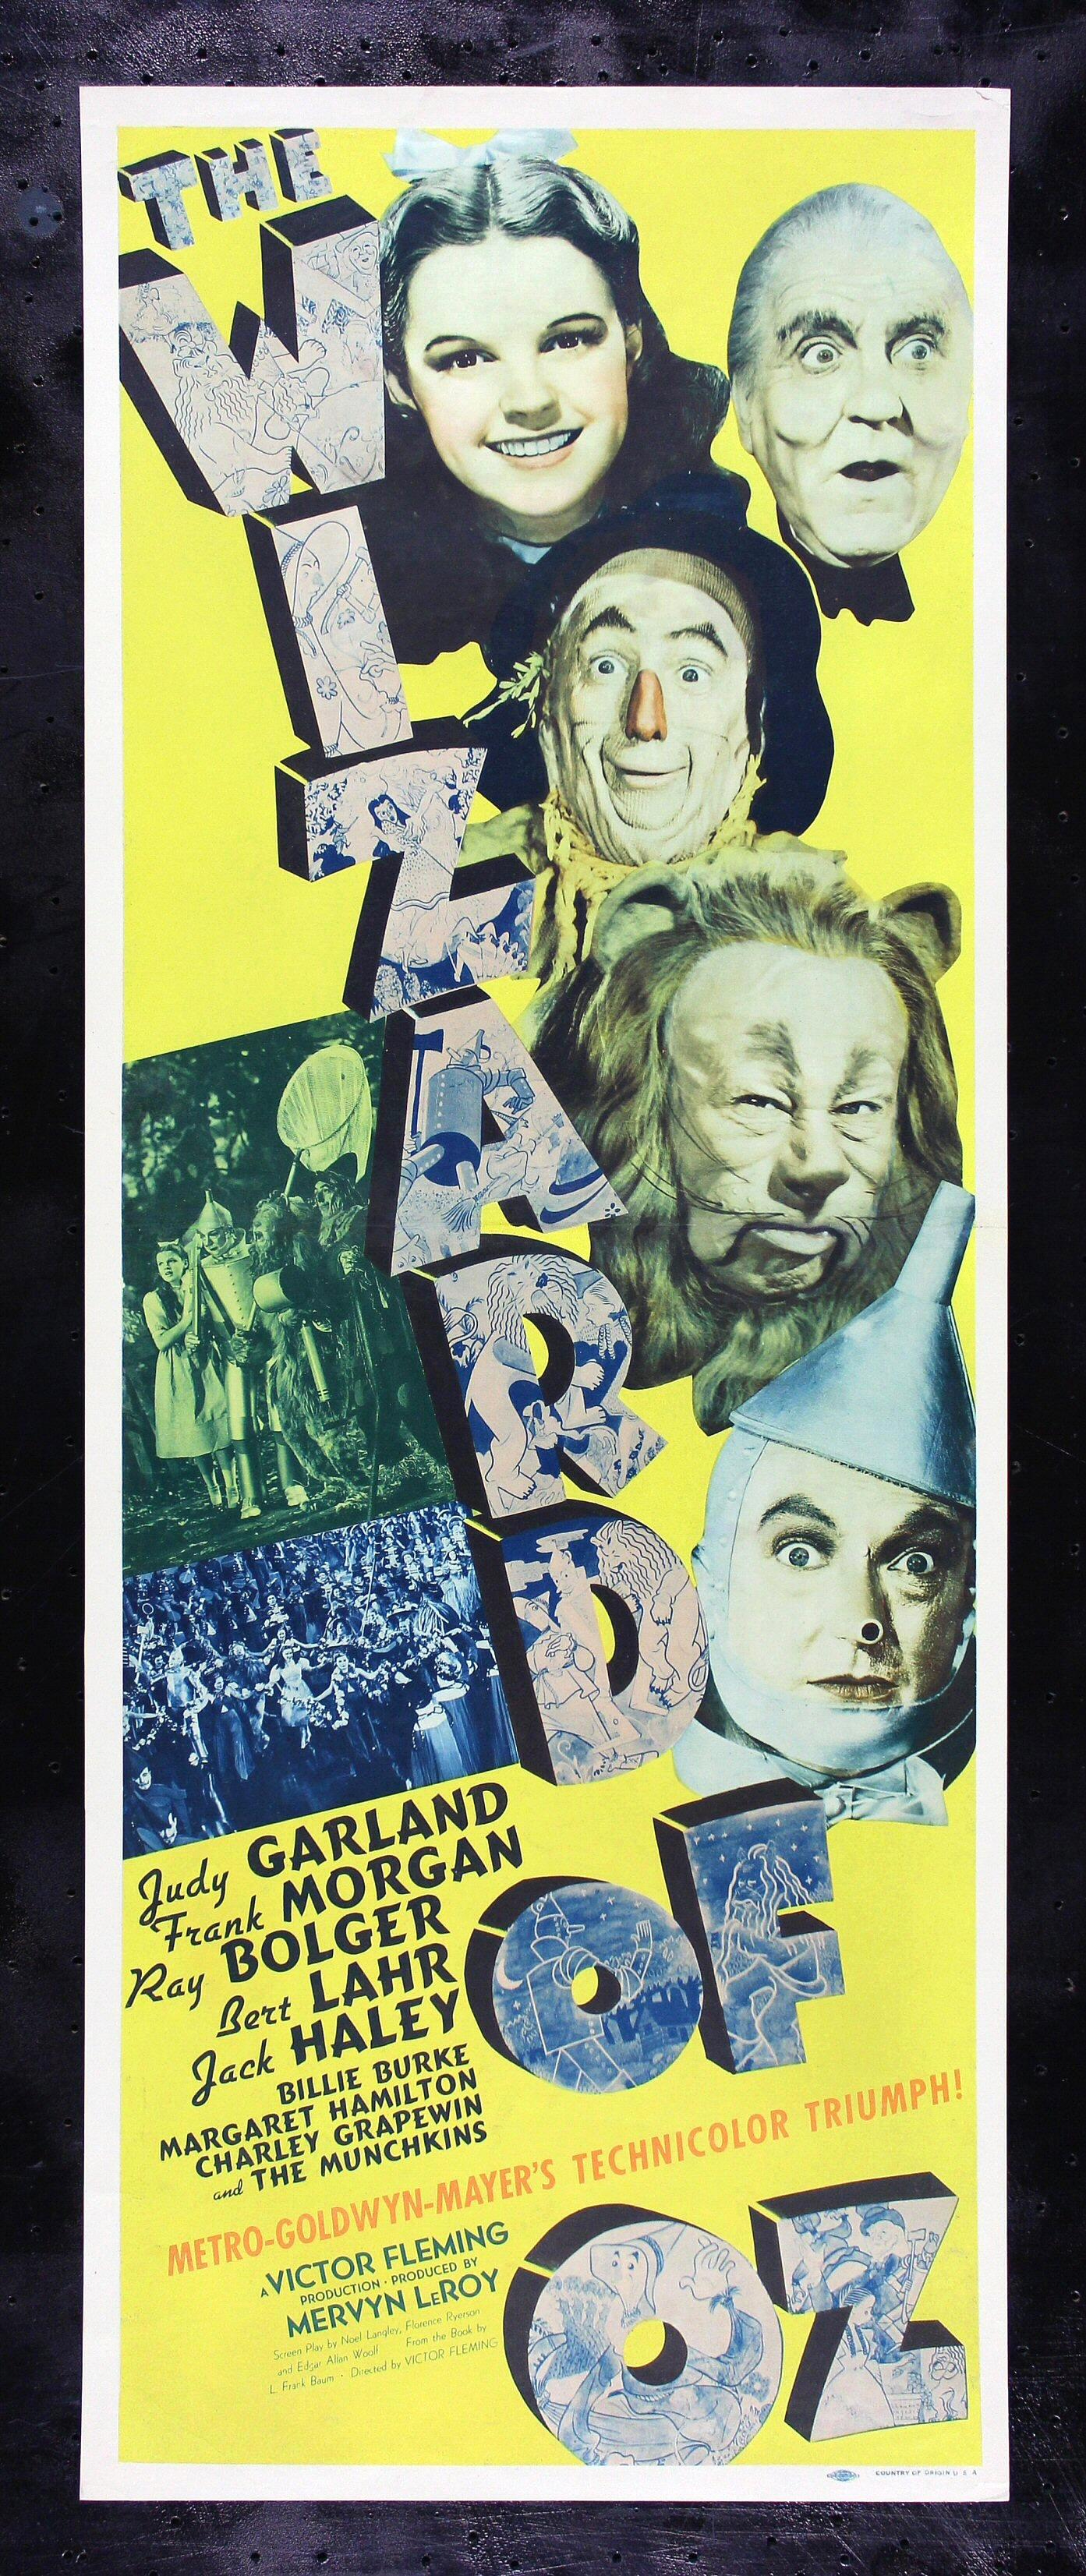 the wizard of oz cinemasterpieces original movie poster